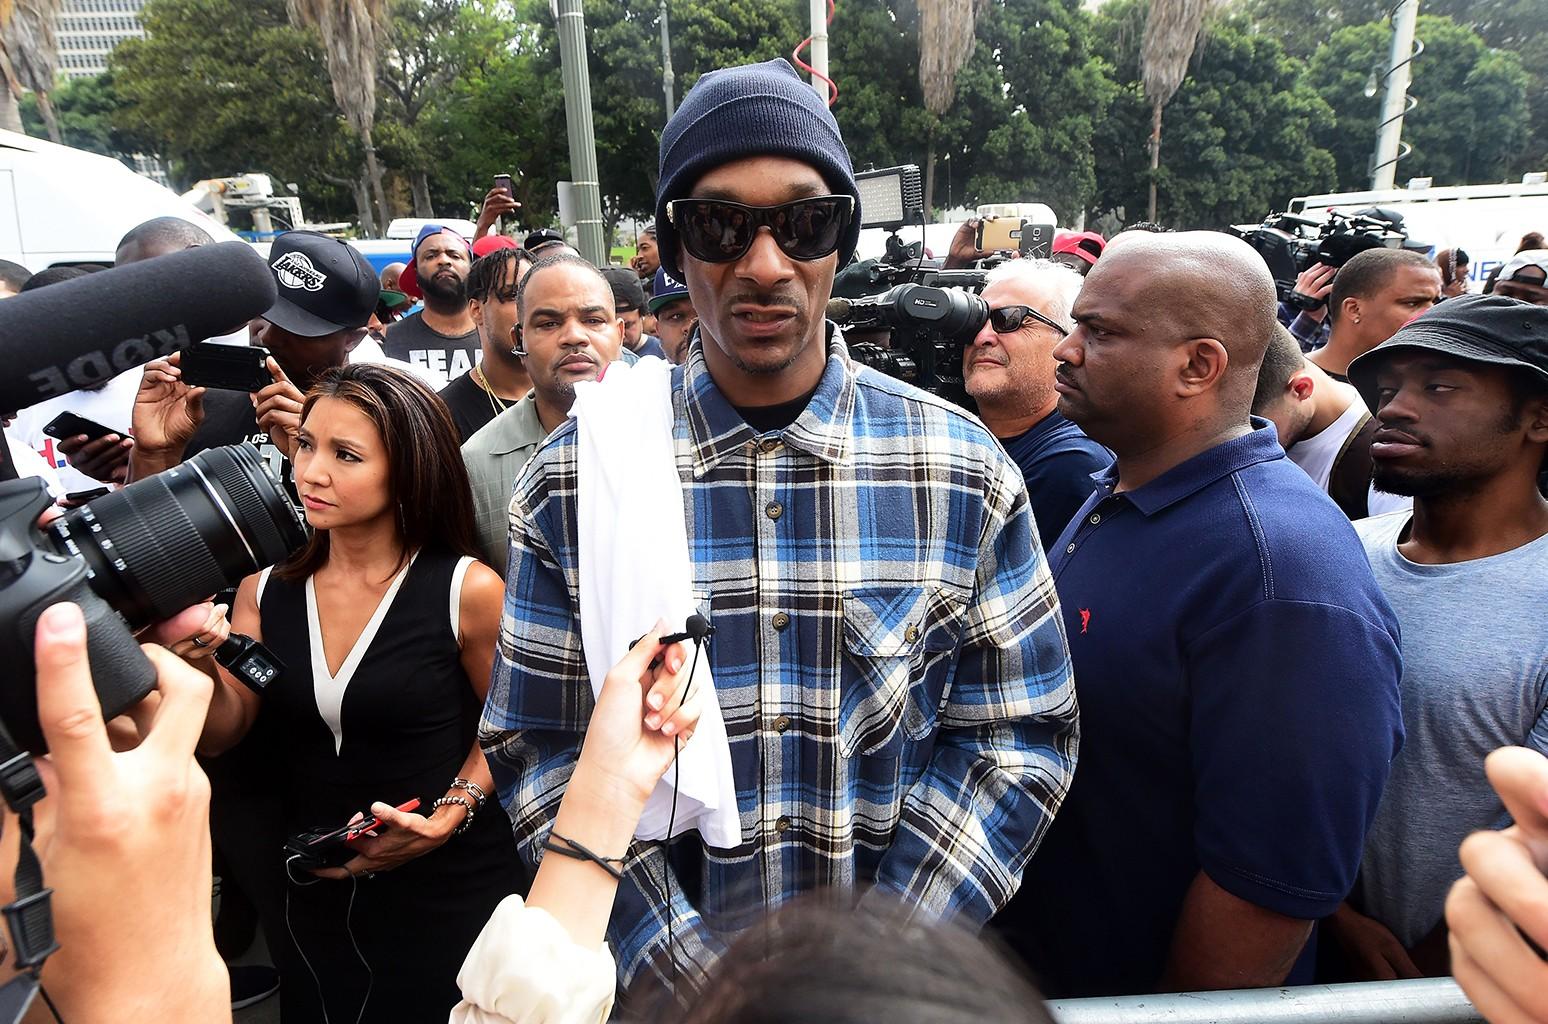 Snoop Dogg at LA Demonstration